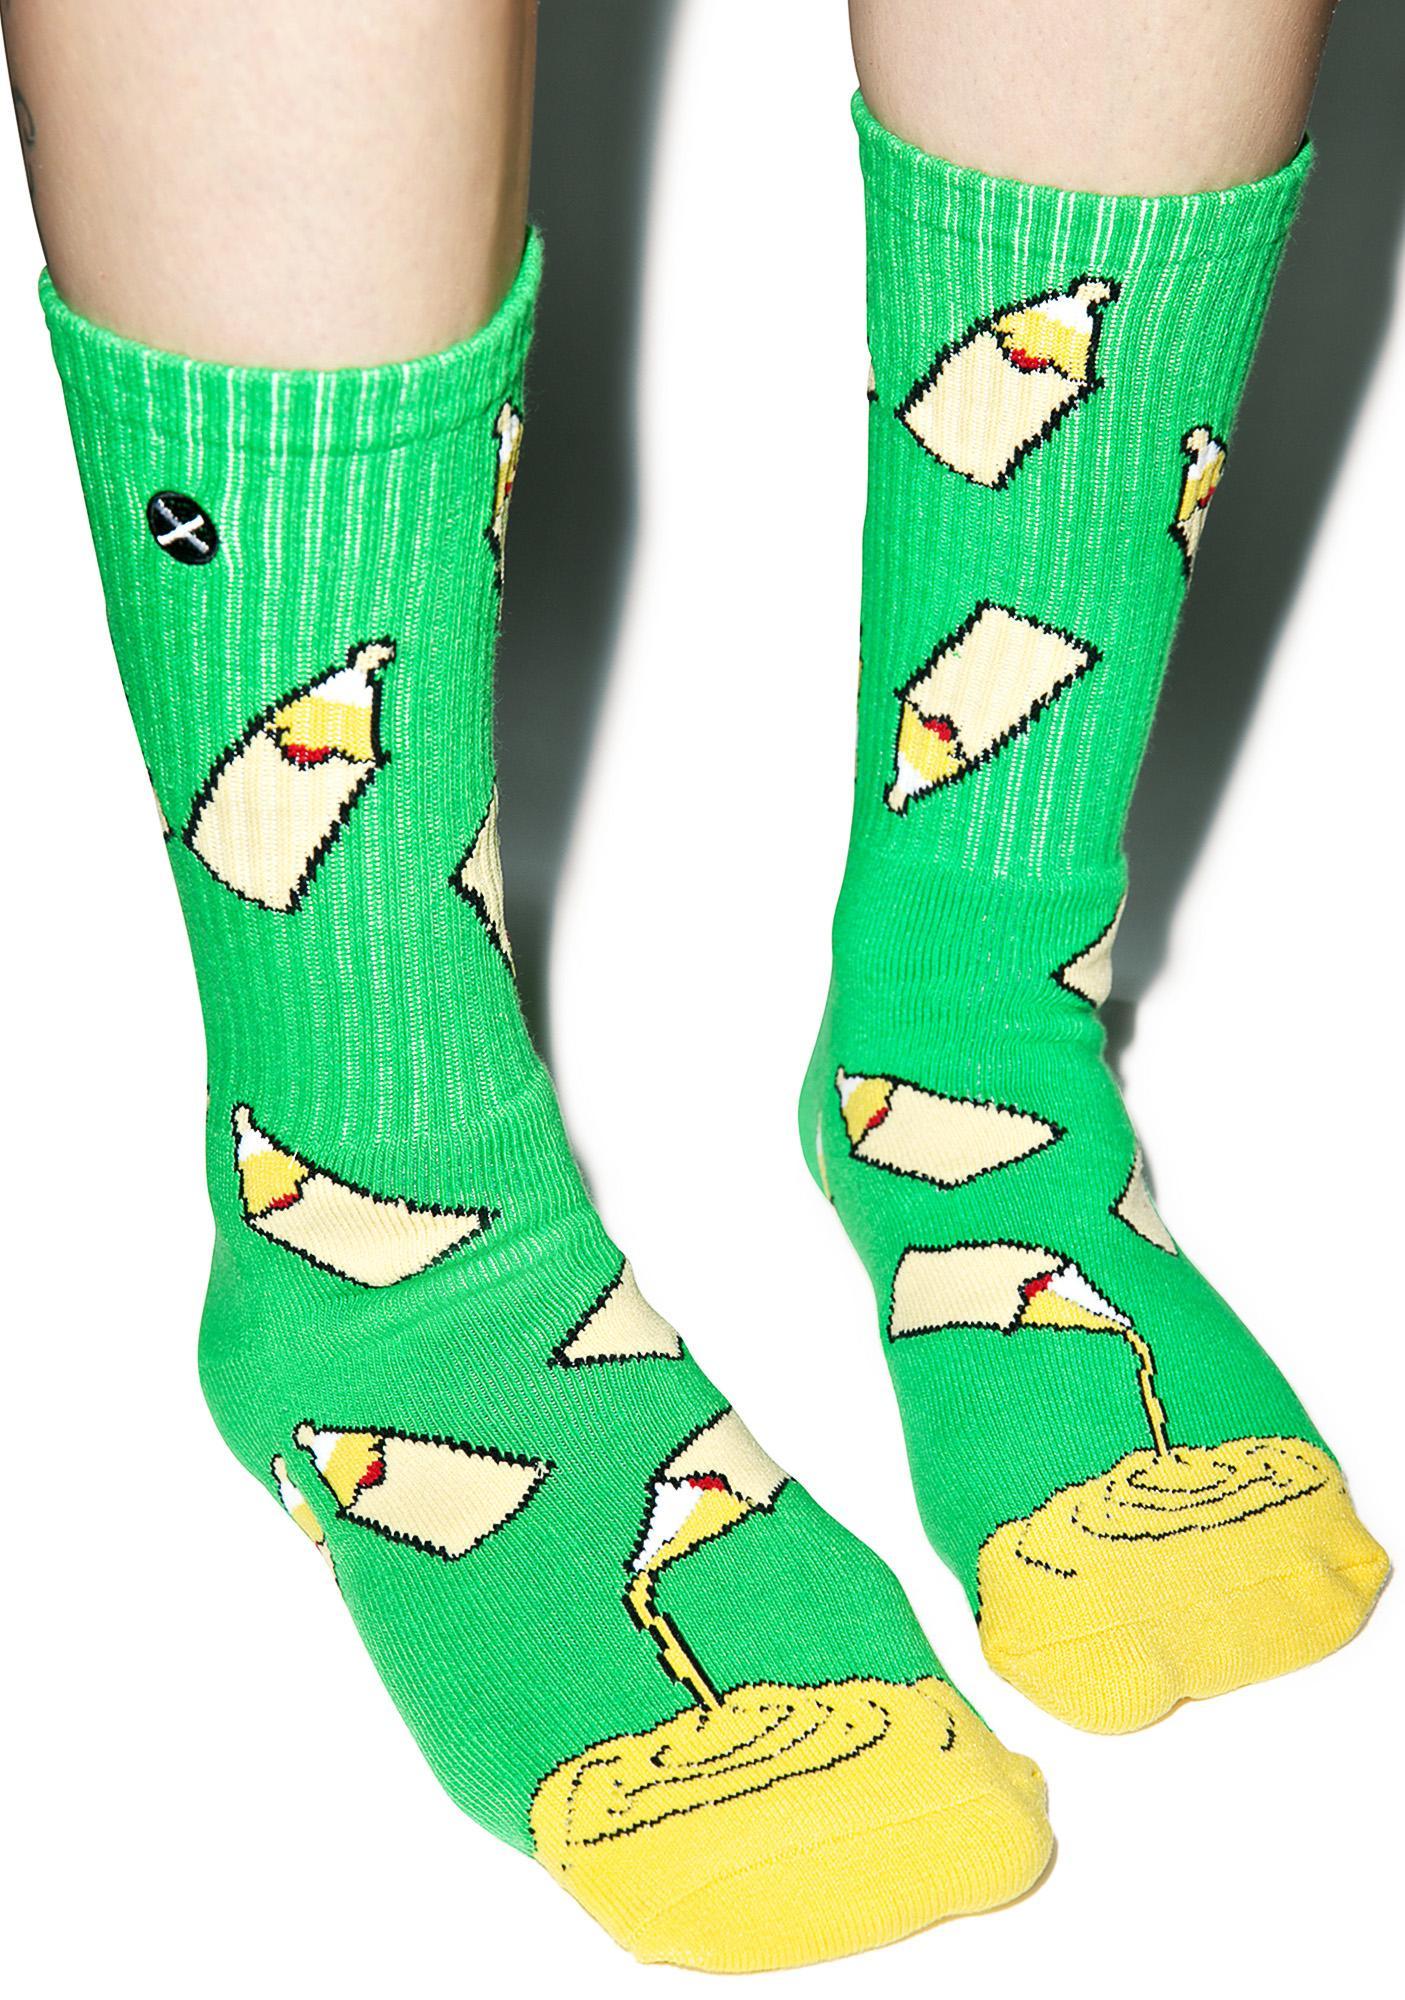 Odd Sox 40s Socks